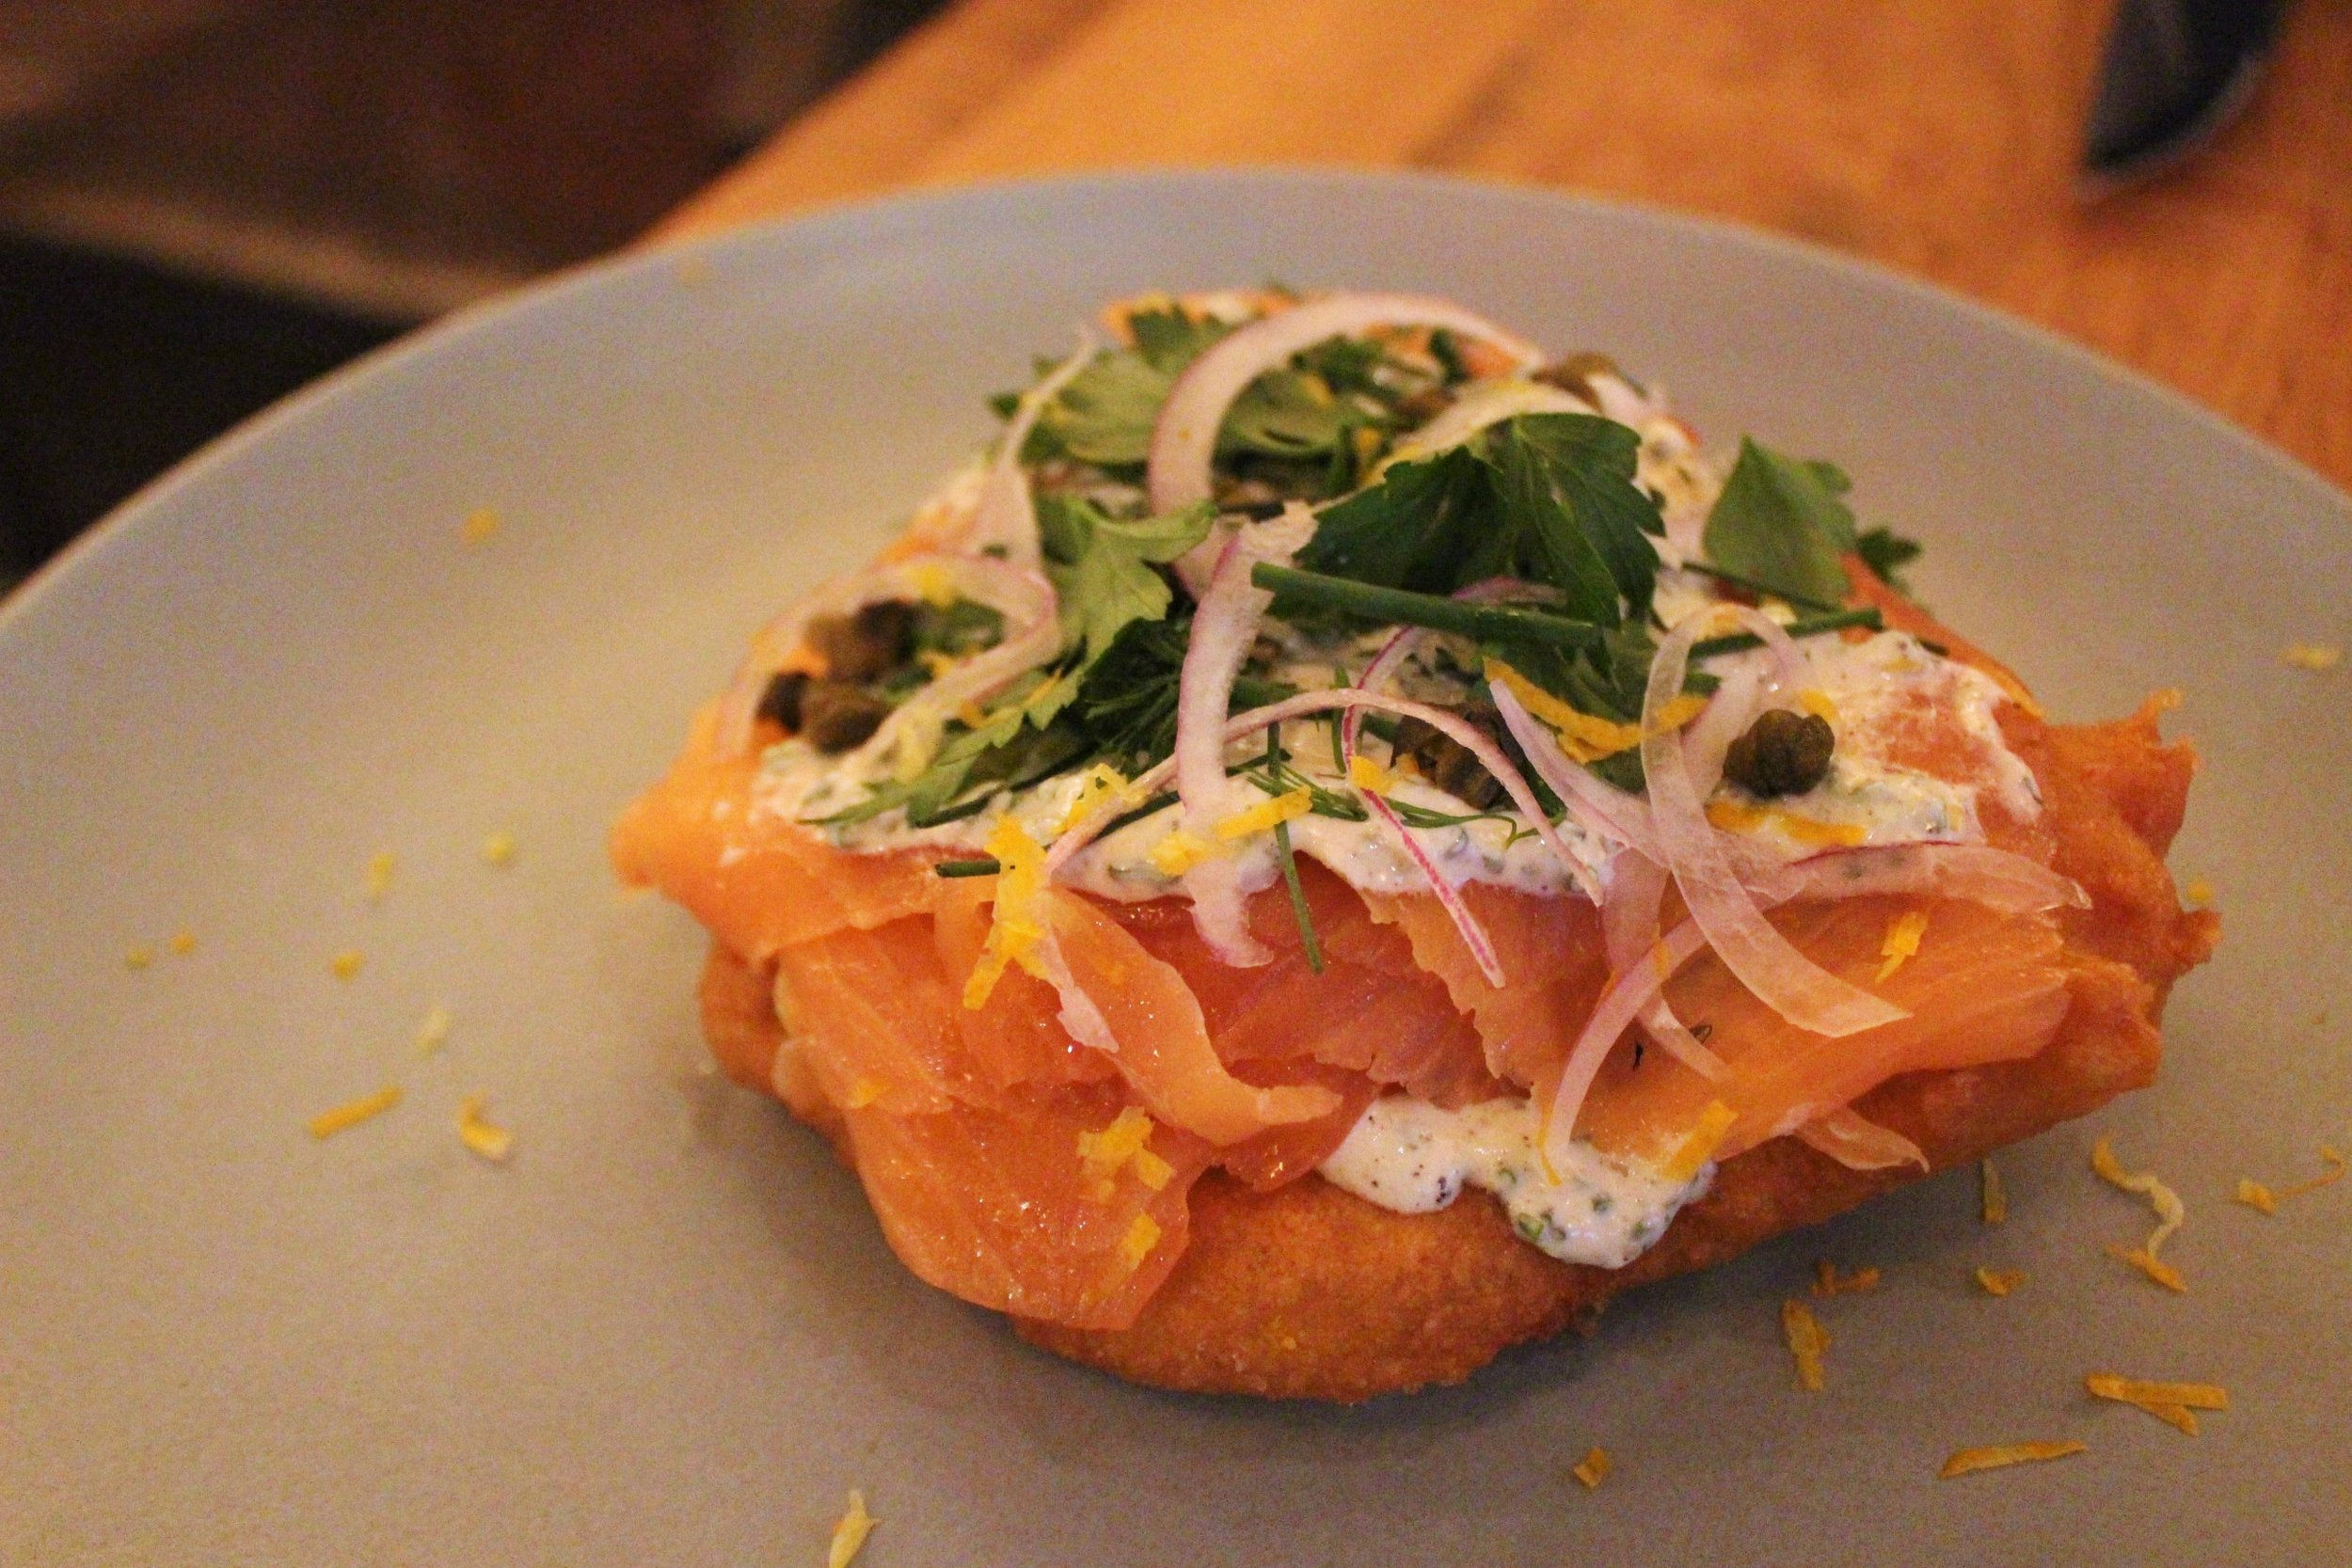 Hungarian Potato Fry Bread: Smoked Salmon, Kefir Ranch, Crispy Caper, Fresh Herbs at Covina